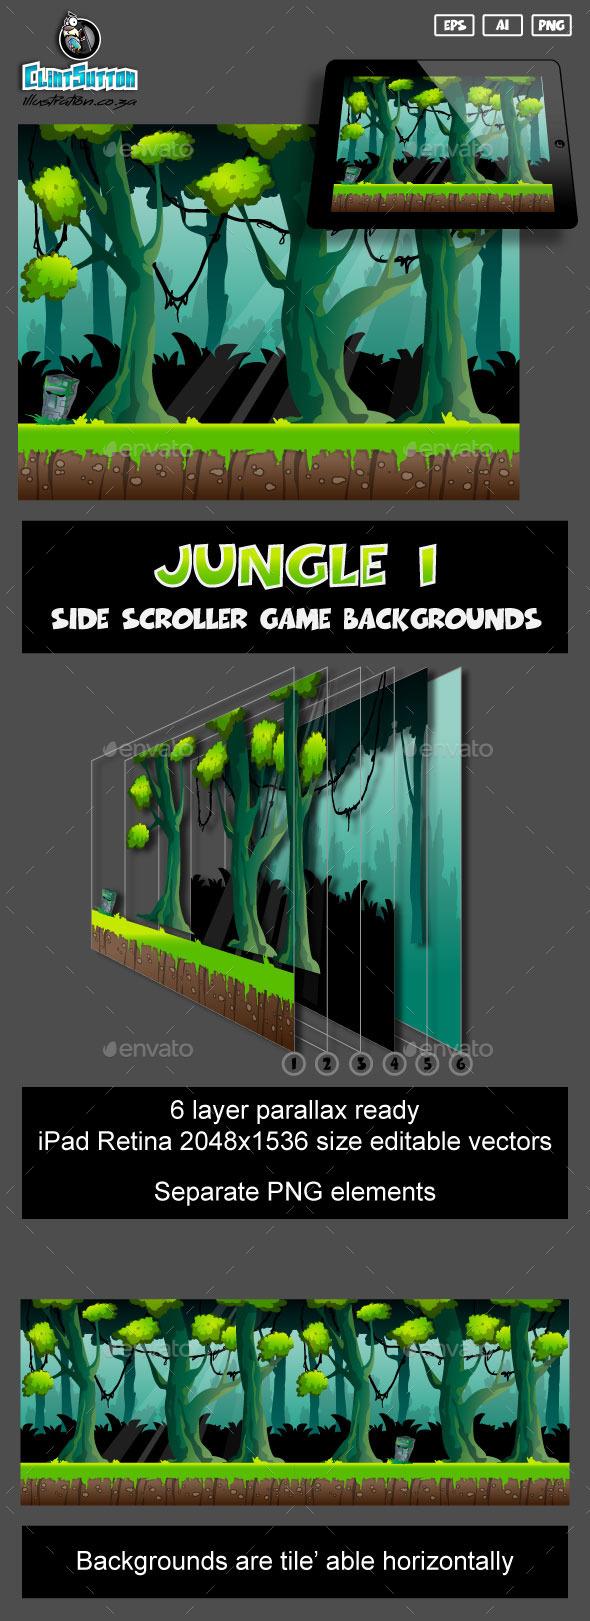 GraphicRiver Jungle1 game background 11002259